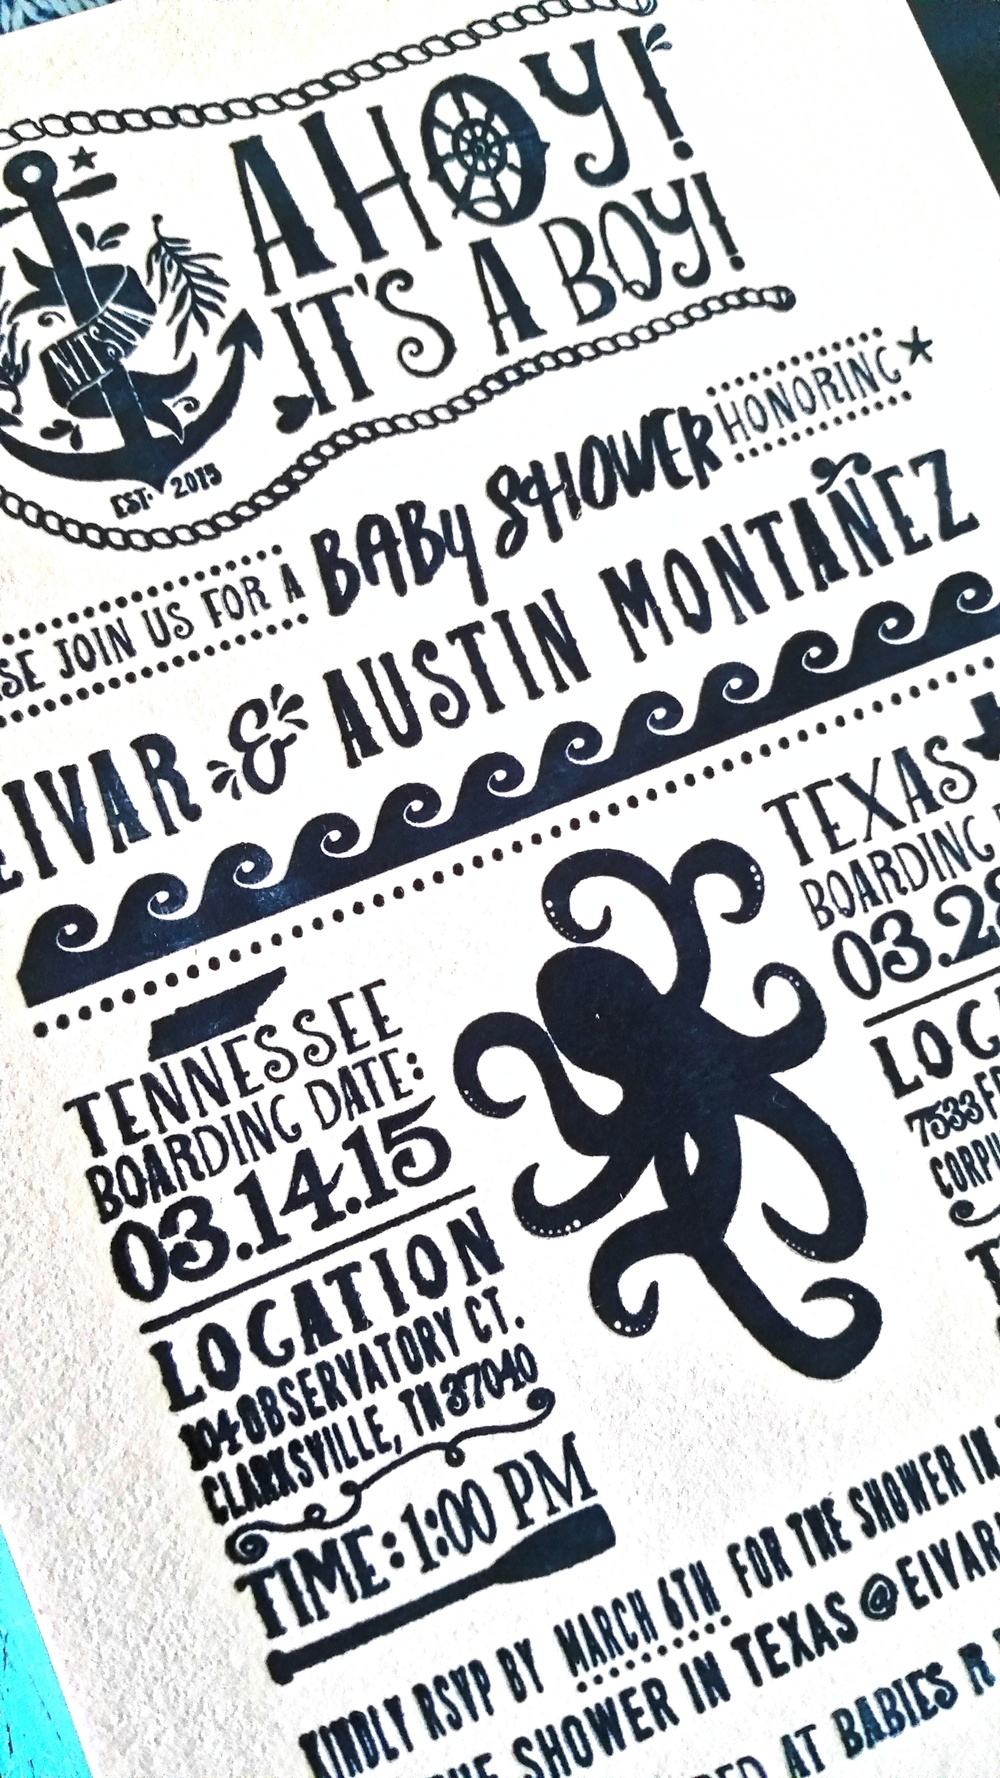 Baby Shower_Invite 18.jpeg